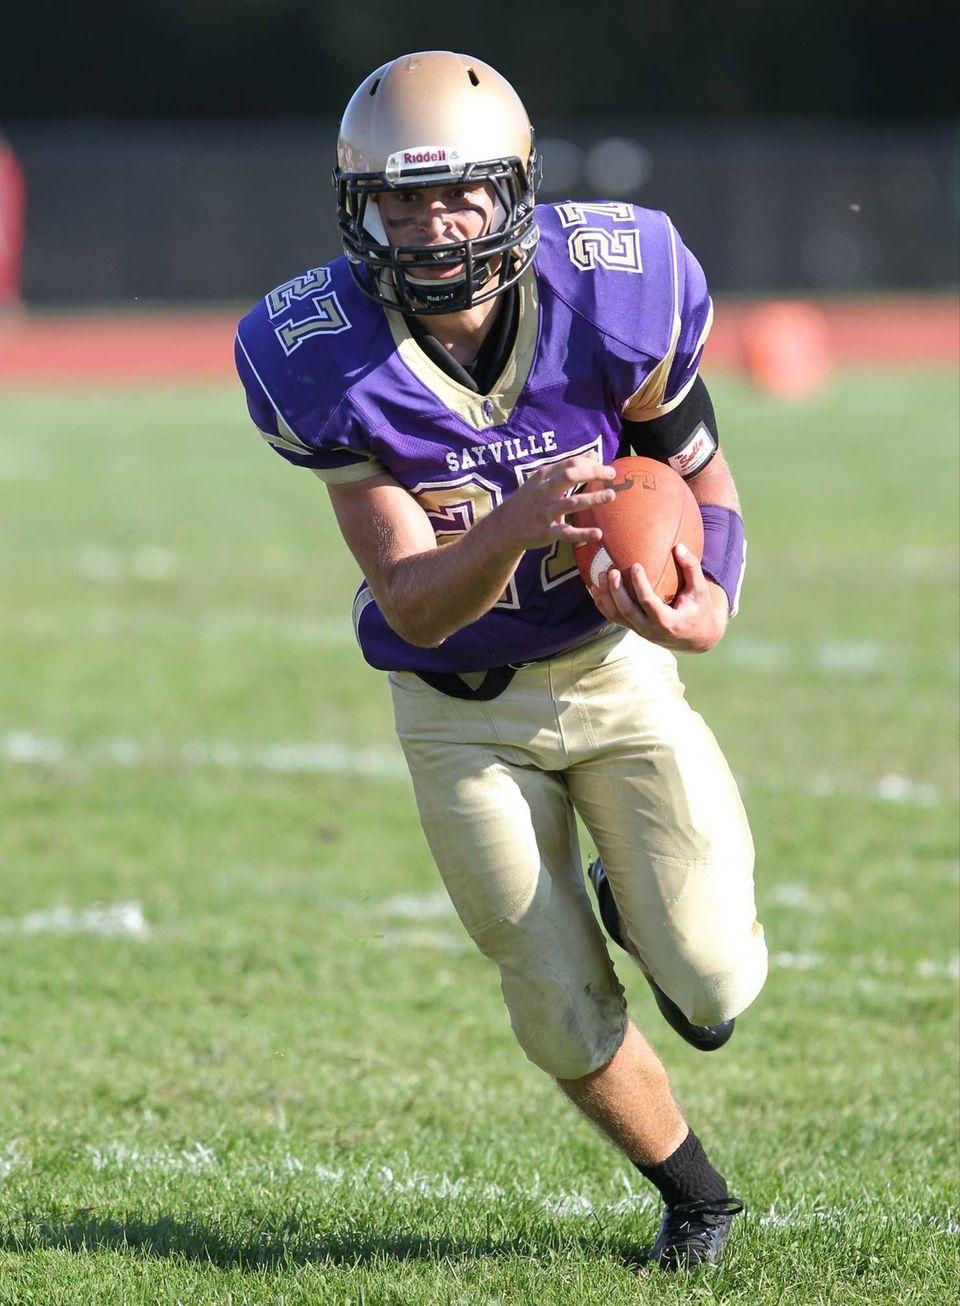 Junior quarterback Jack Coan added to his already